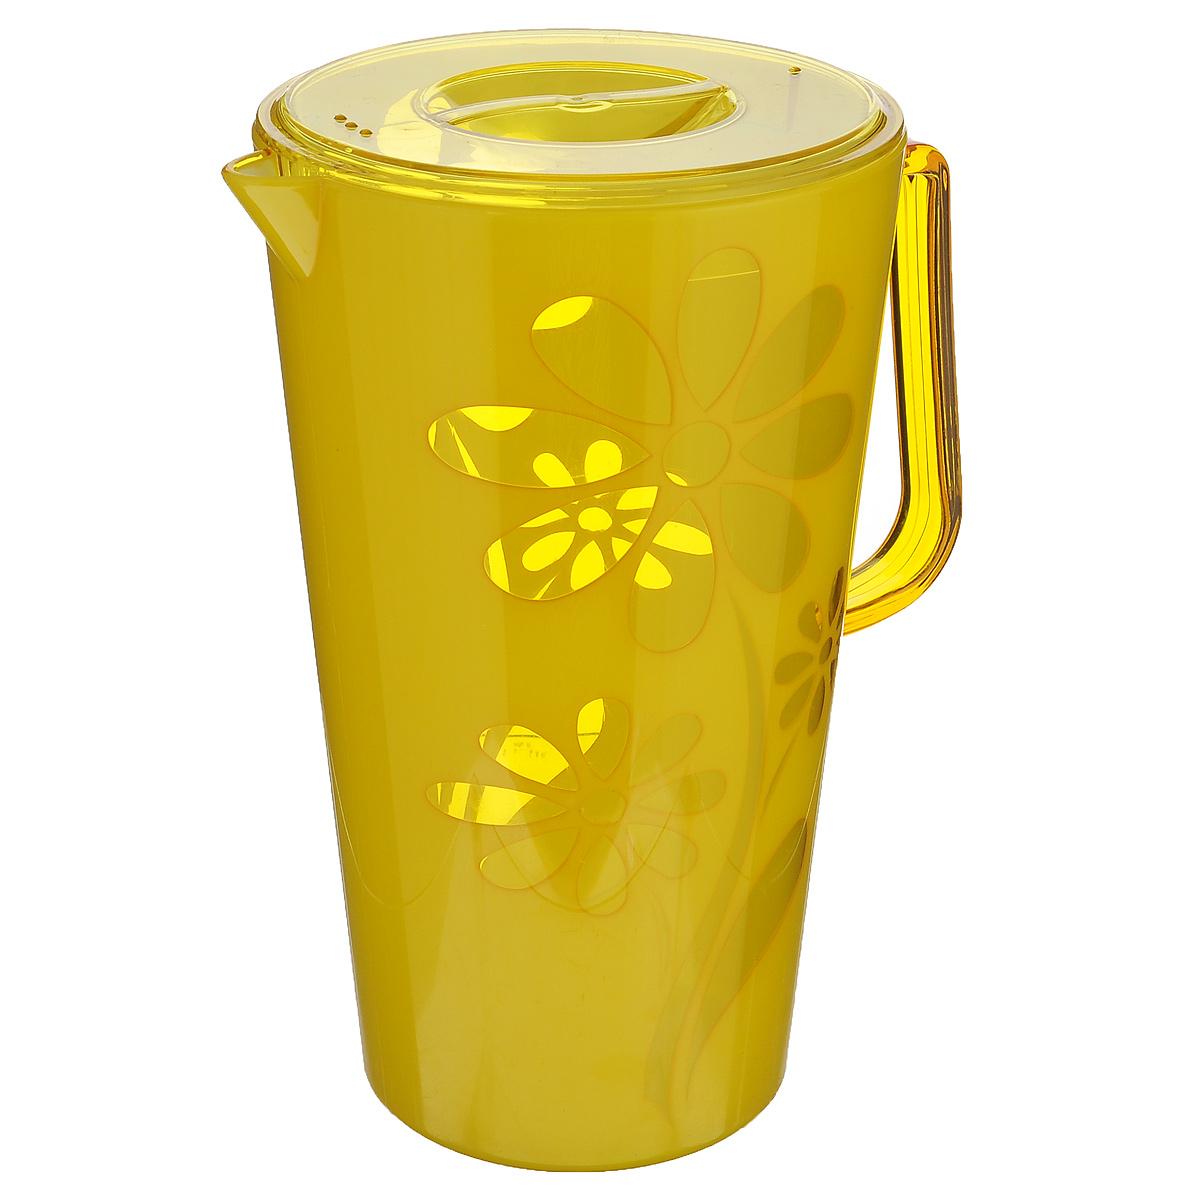 Кувшин Альтернатива Соблазн, с крышкой, цвет: желтый, 2,5 л чаша альтернатива соблазн цвет красный 1 7 л